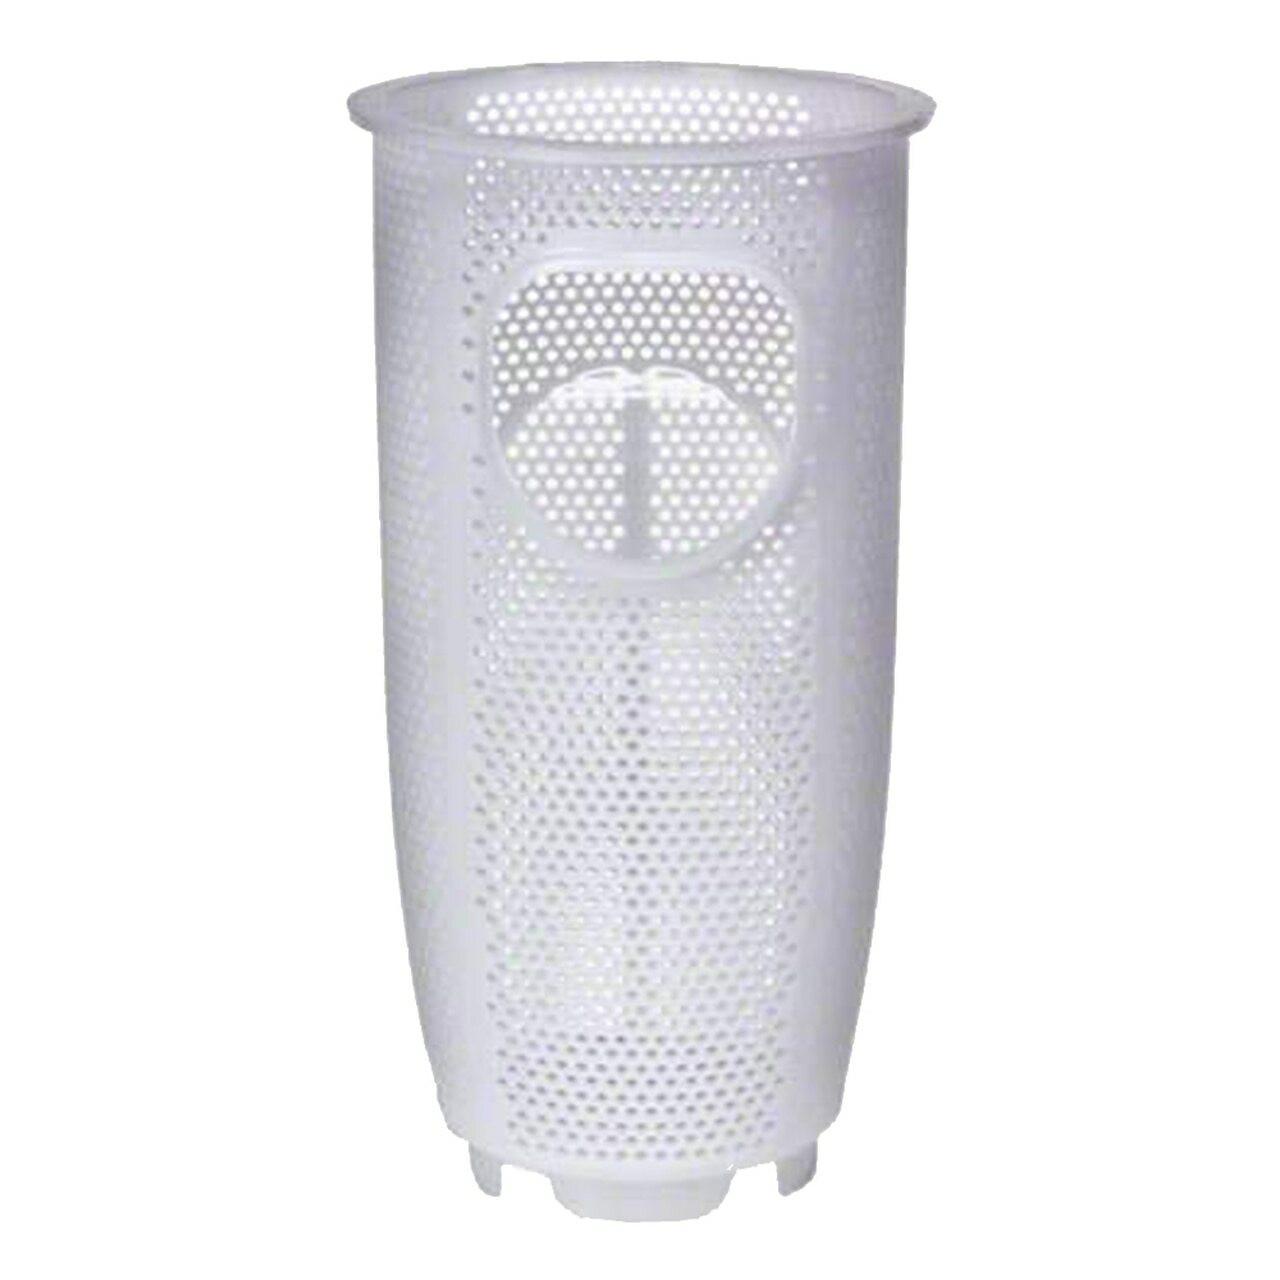 Pentair XF Series Replacement Basket For WhisperFloXF